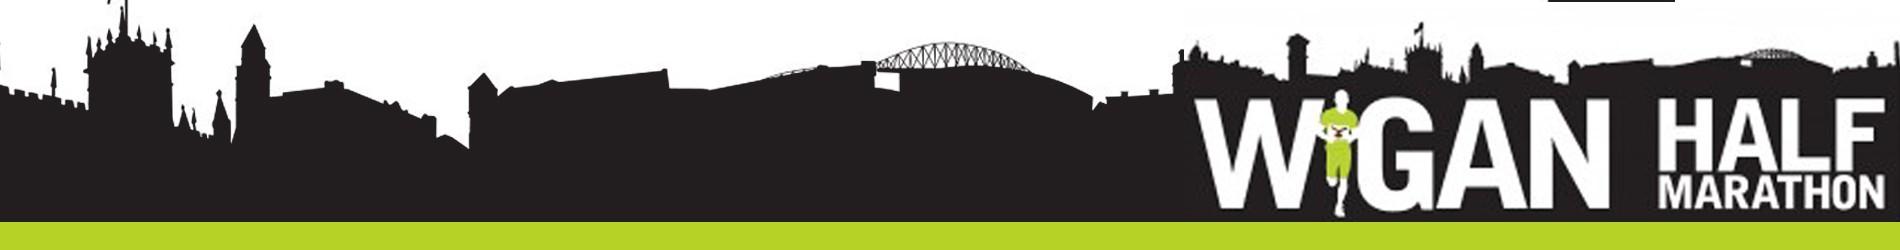 The Wigan Half Marathon 2022